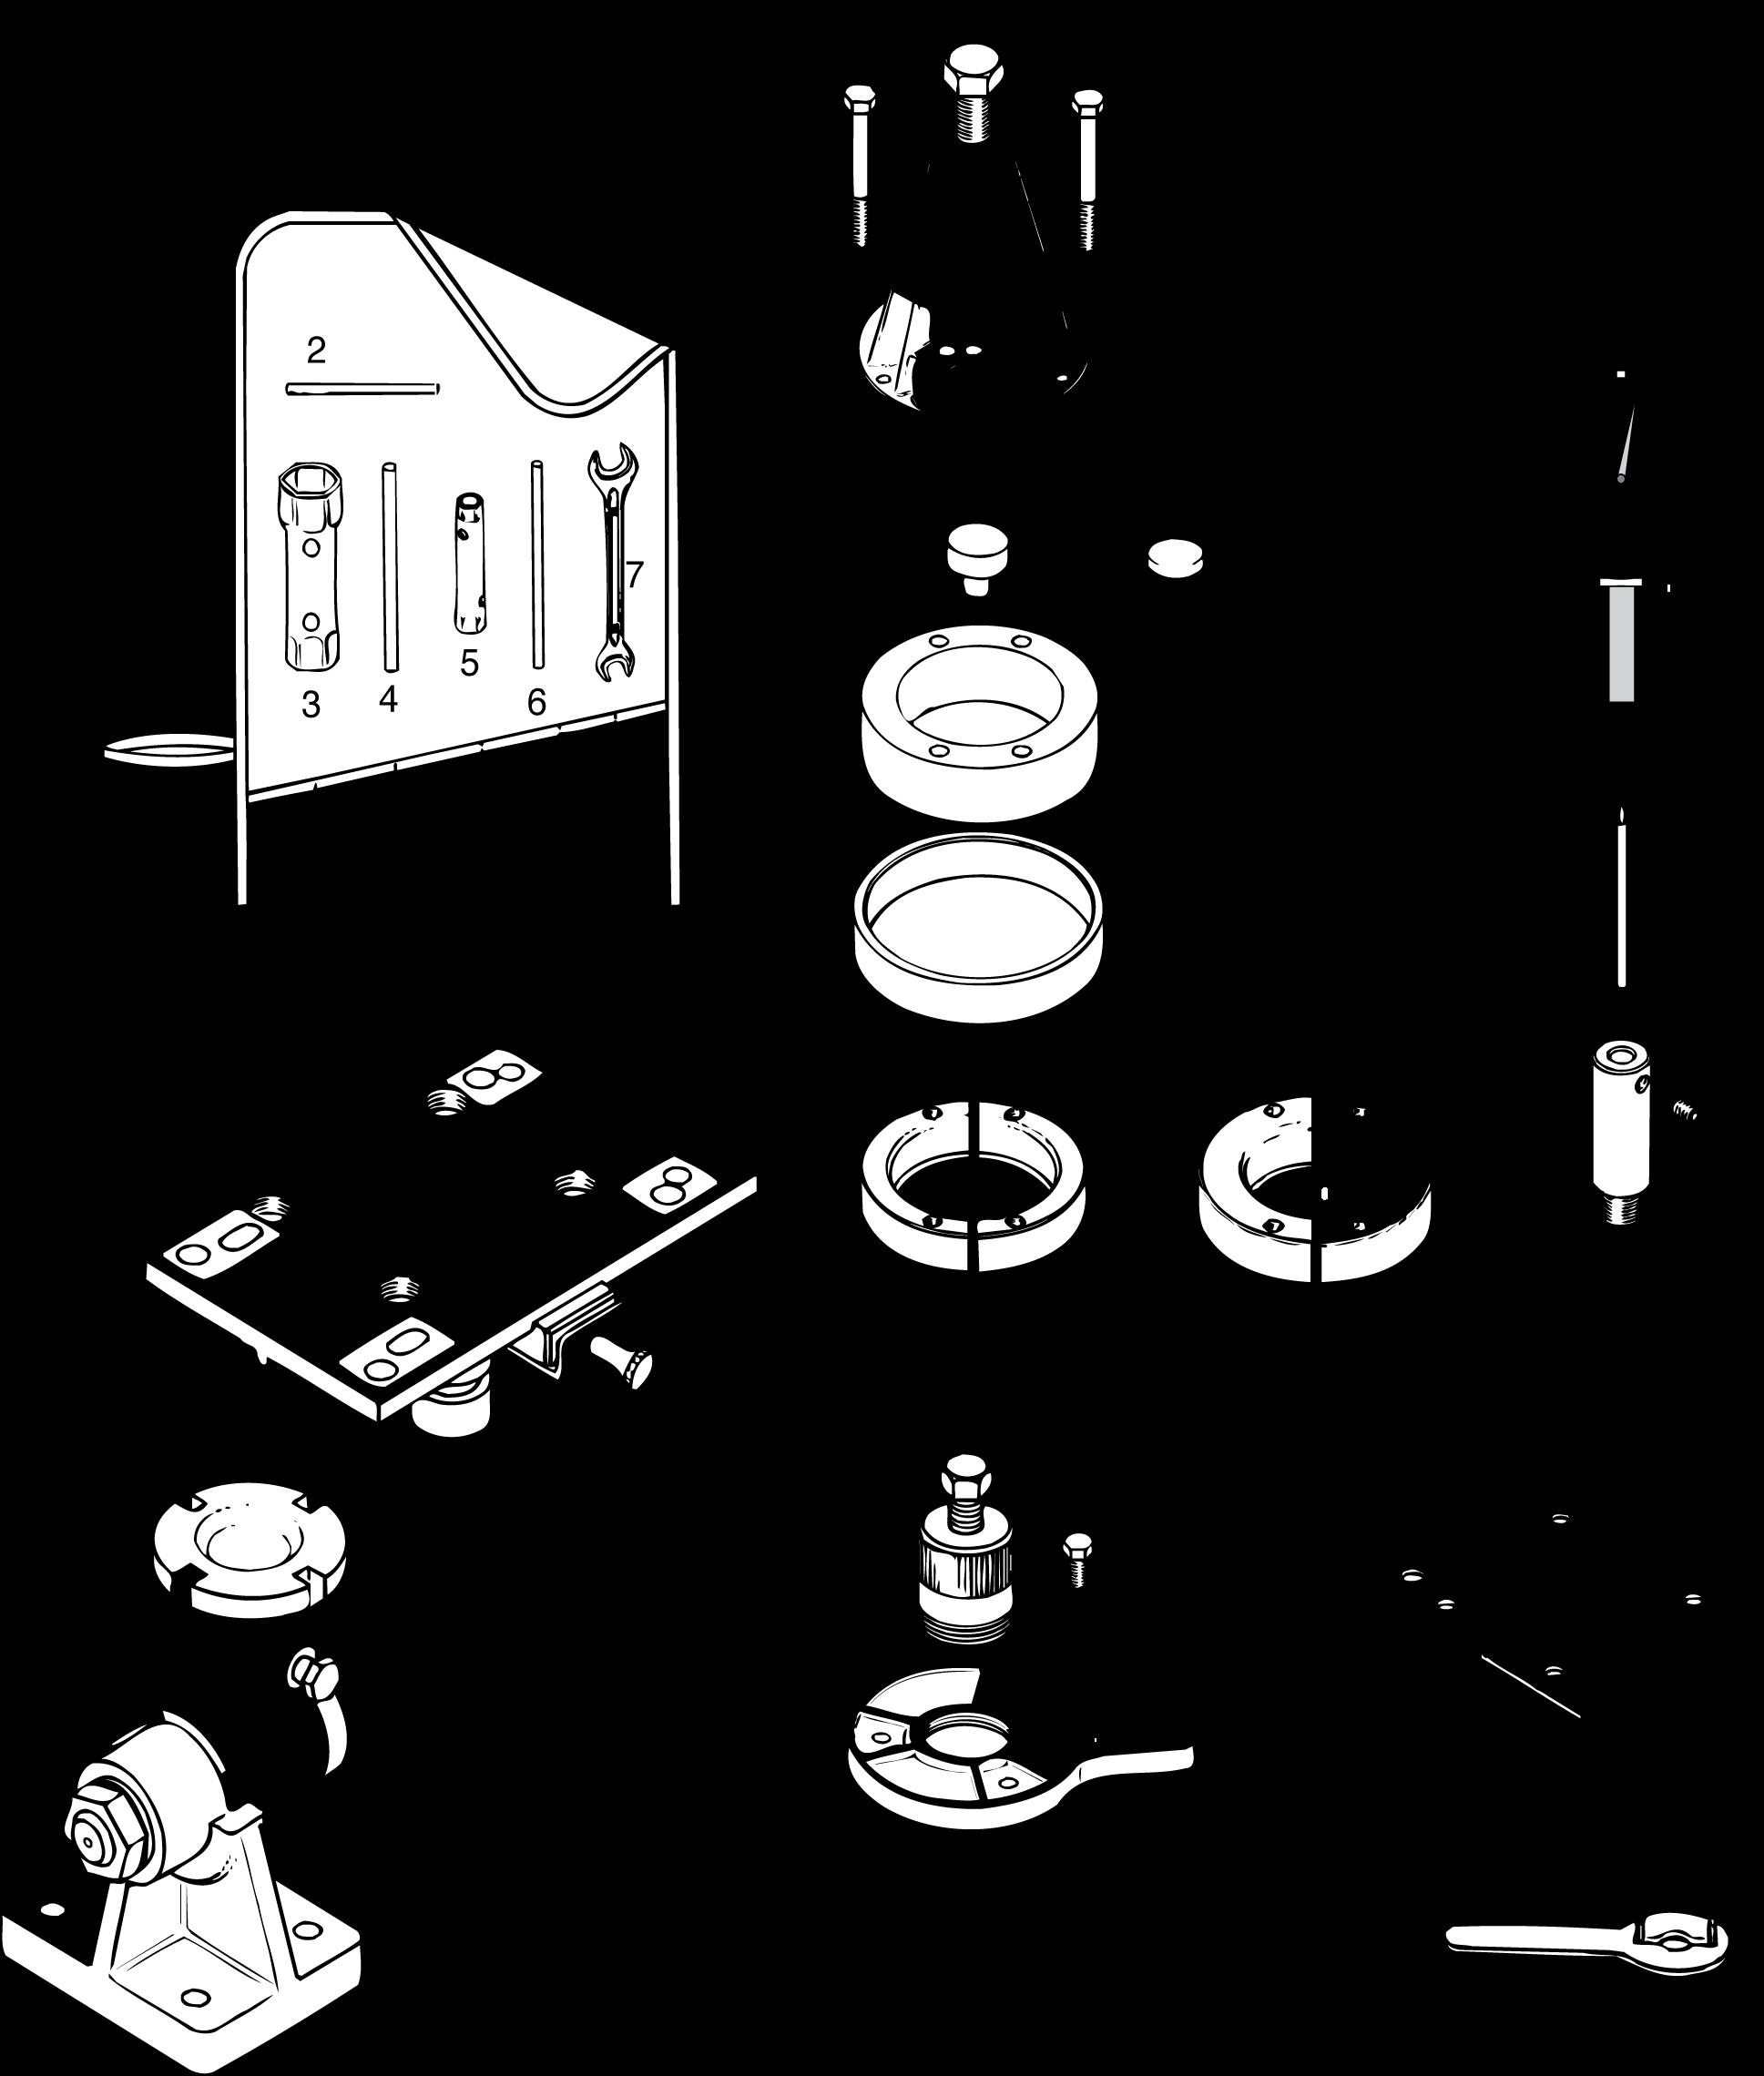 small engine repair tools catalog